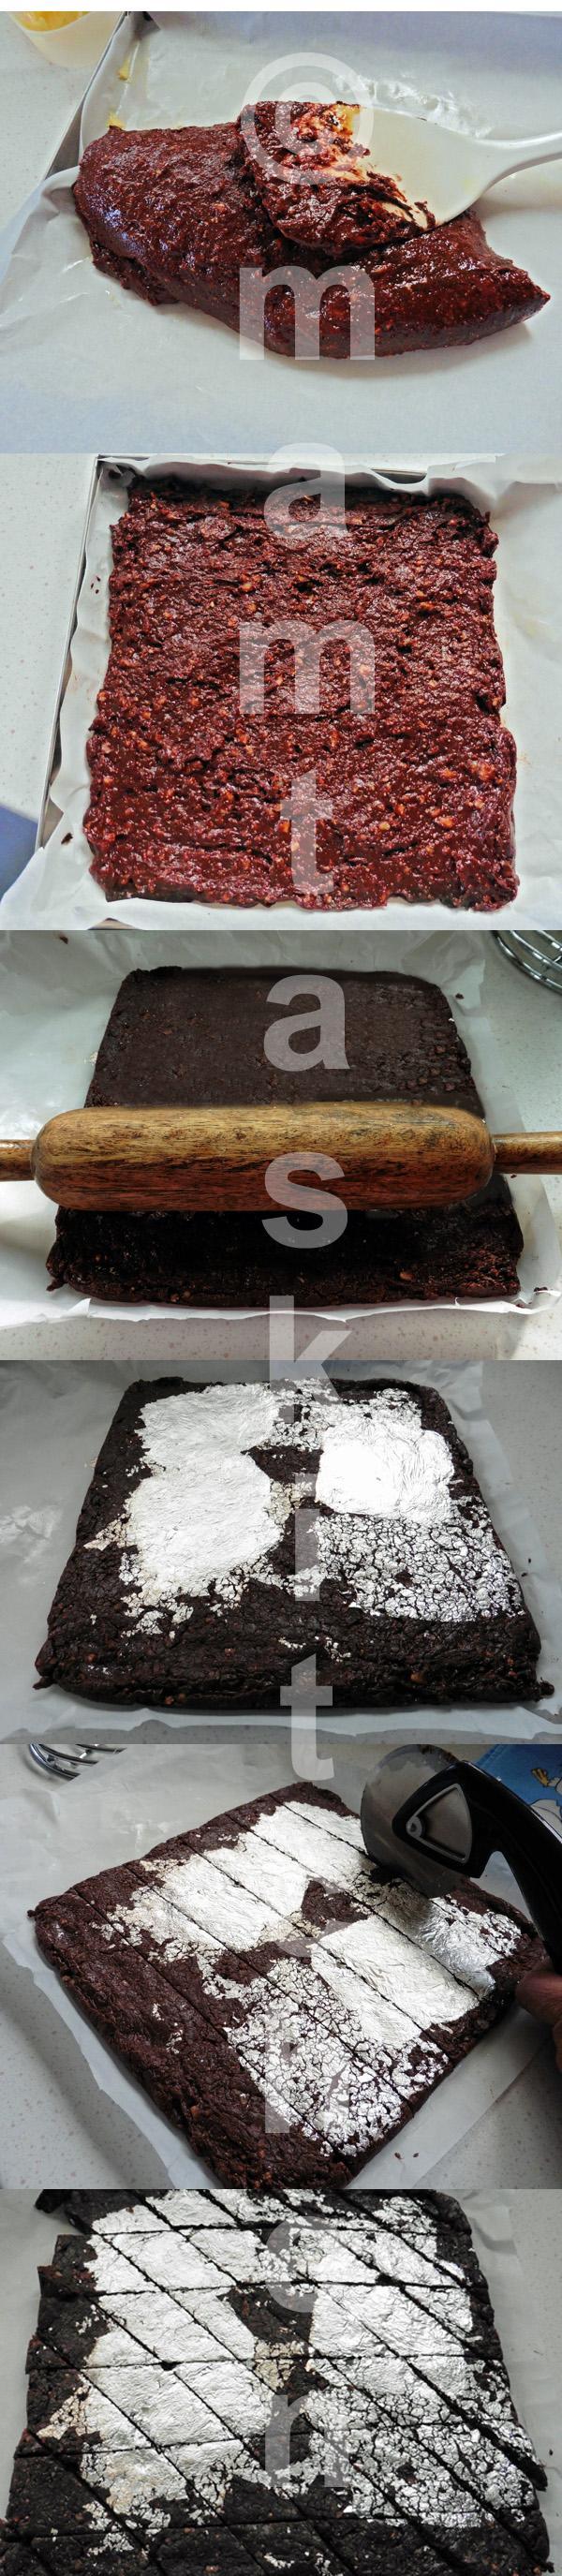 Chocolate Burfi - A Quick Version